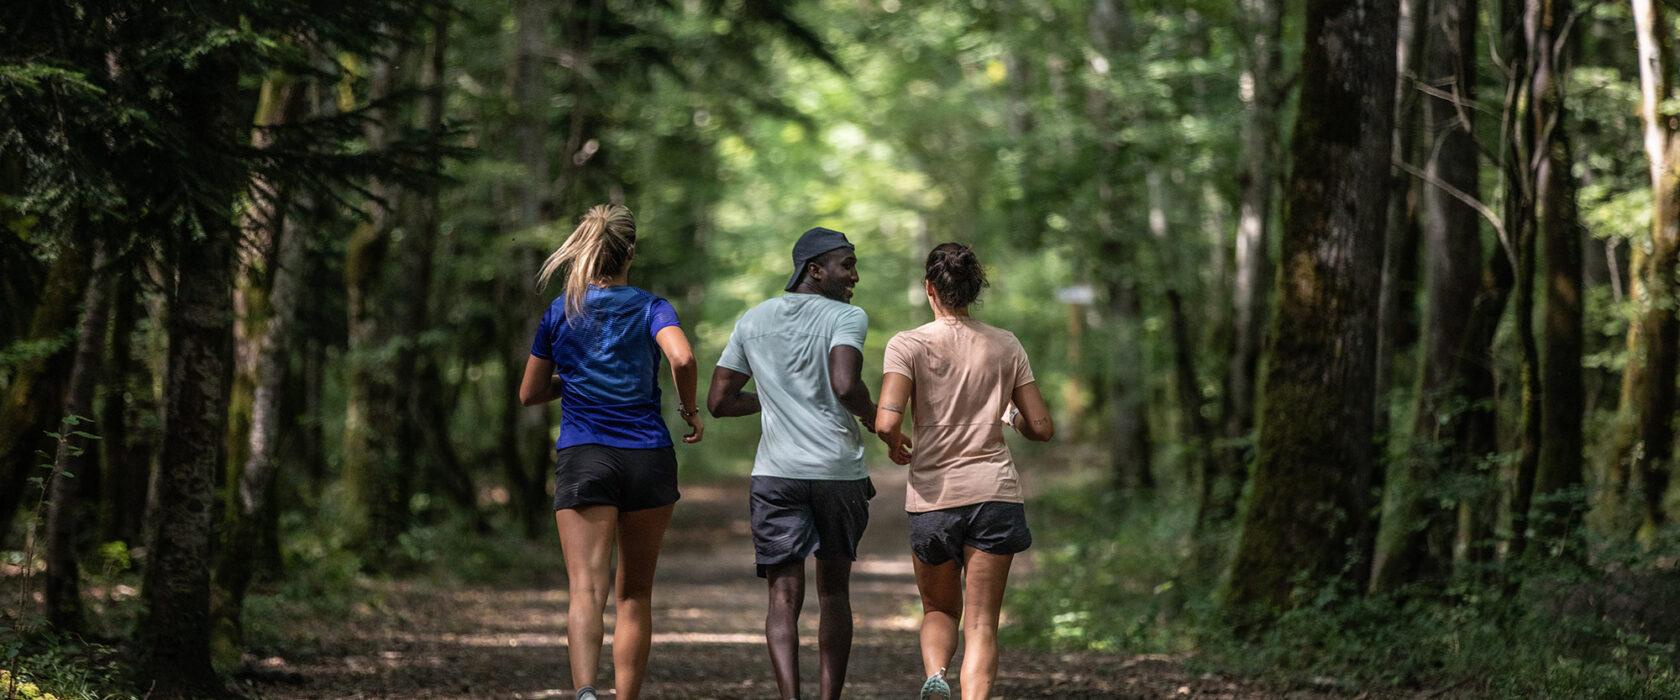 trailrunning salomon